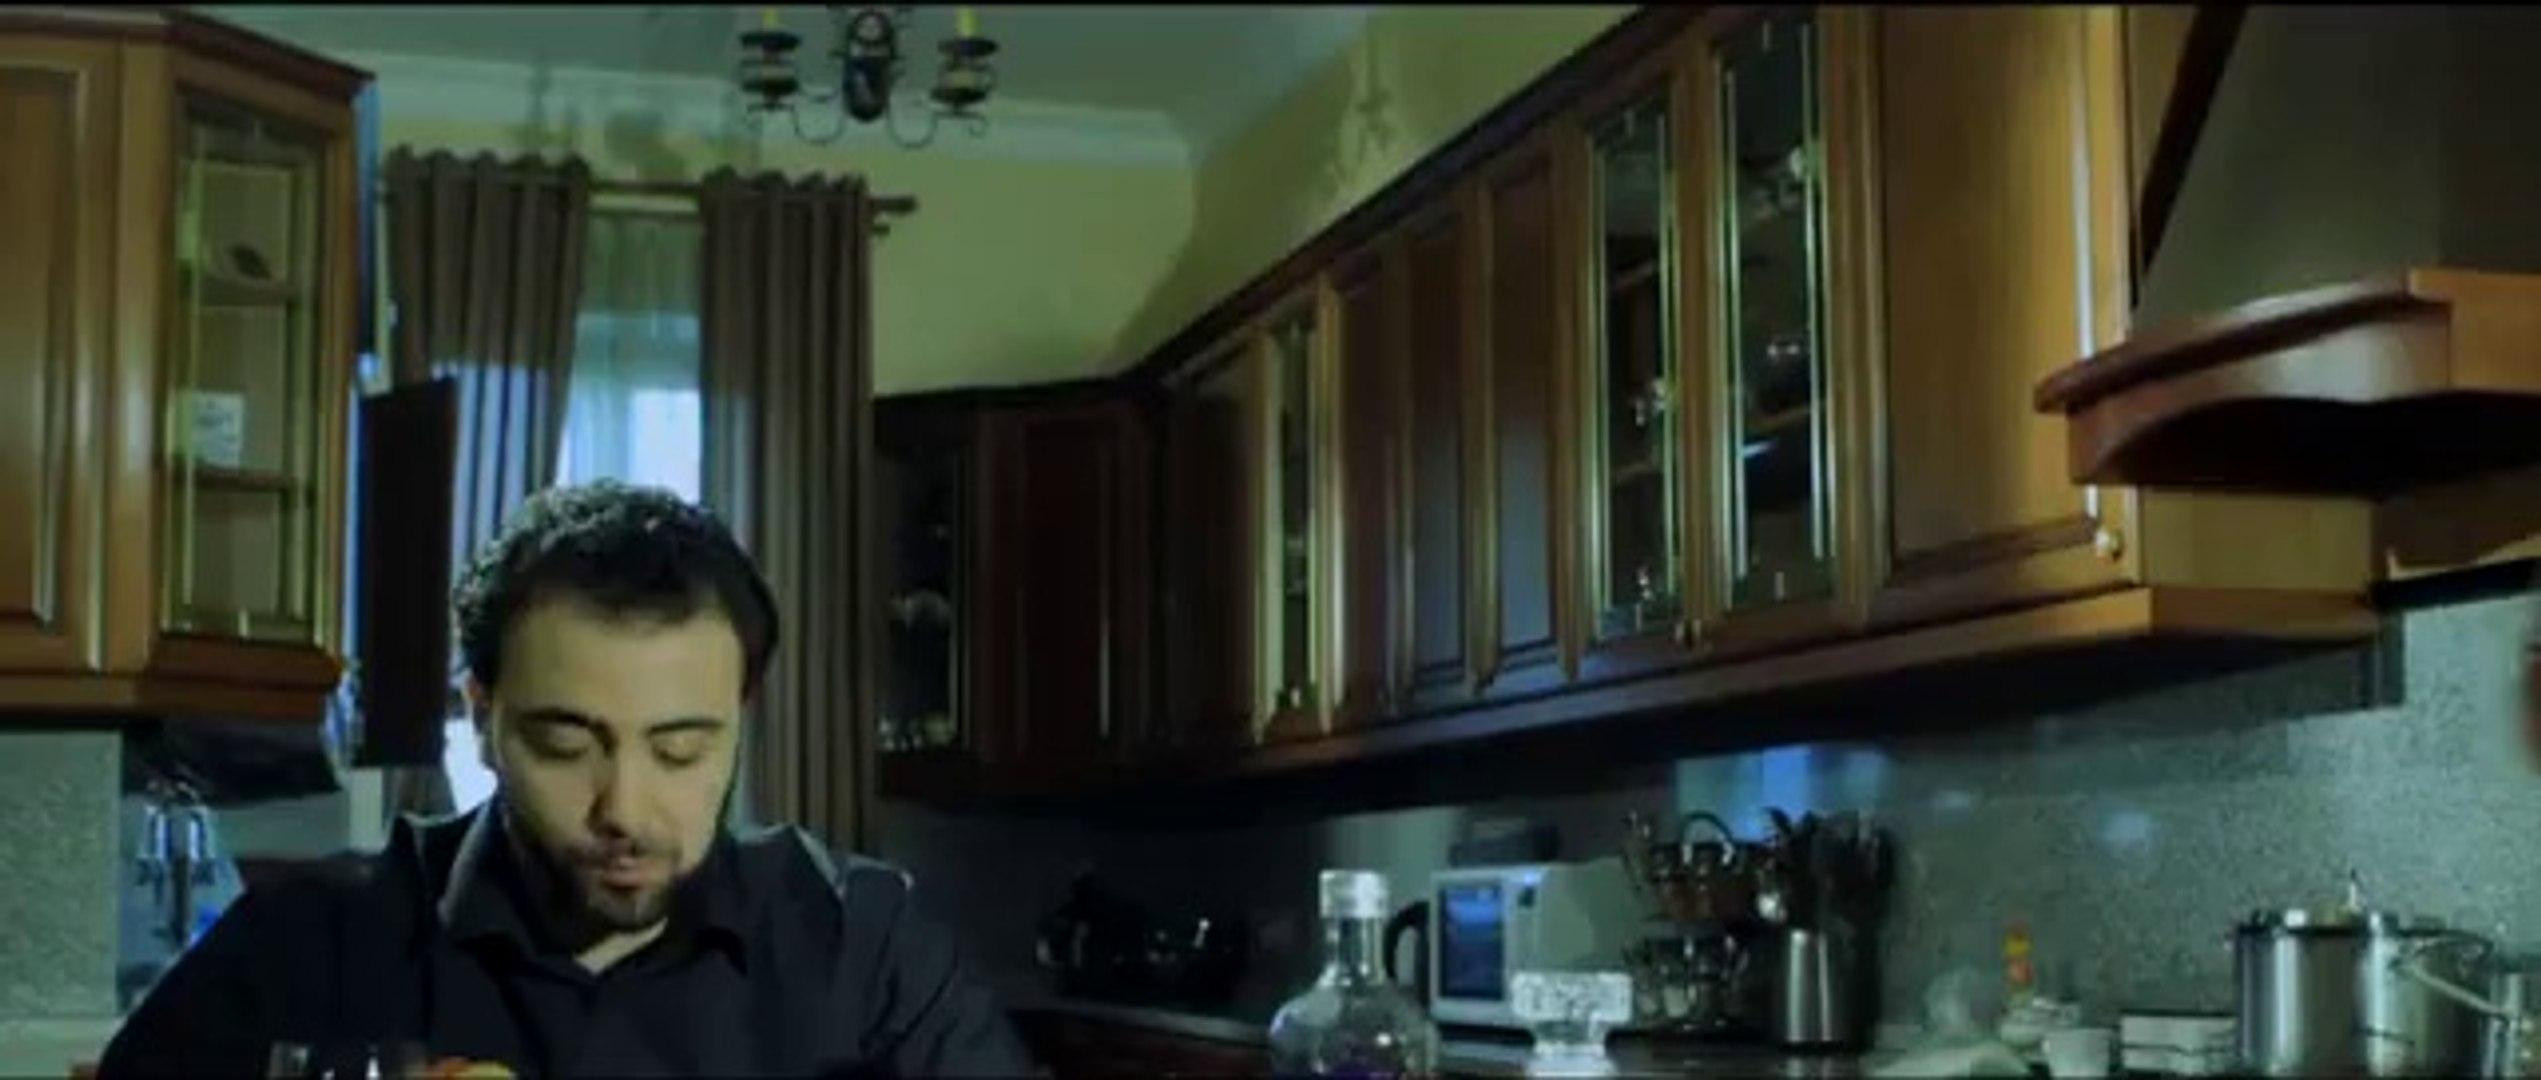 Смотреть онлайн армянский сериал Xaghic durs_10